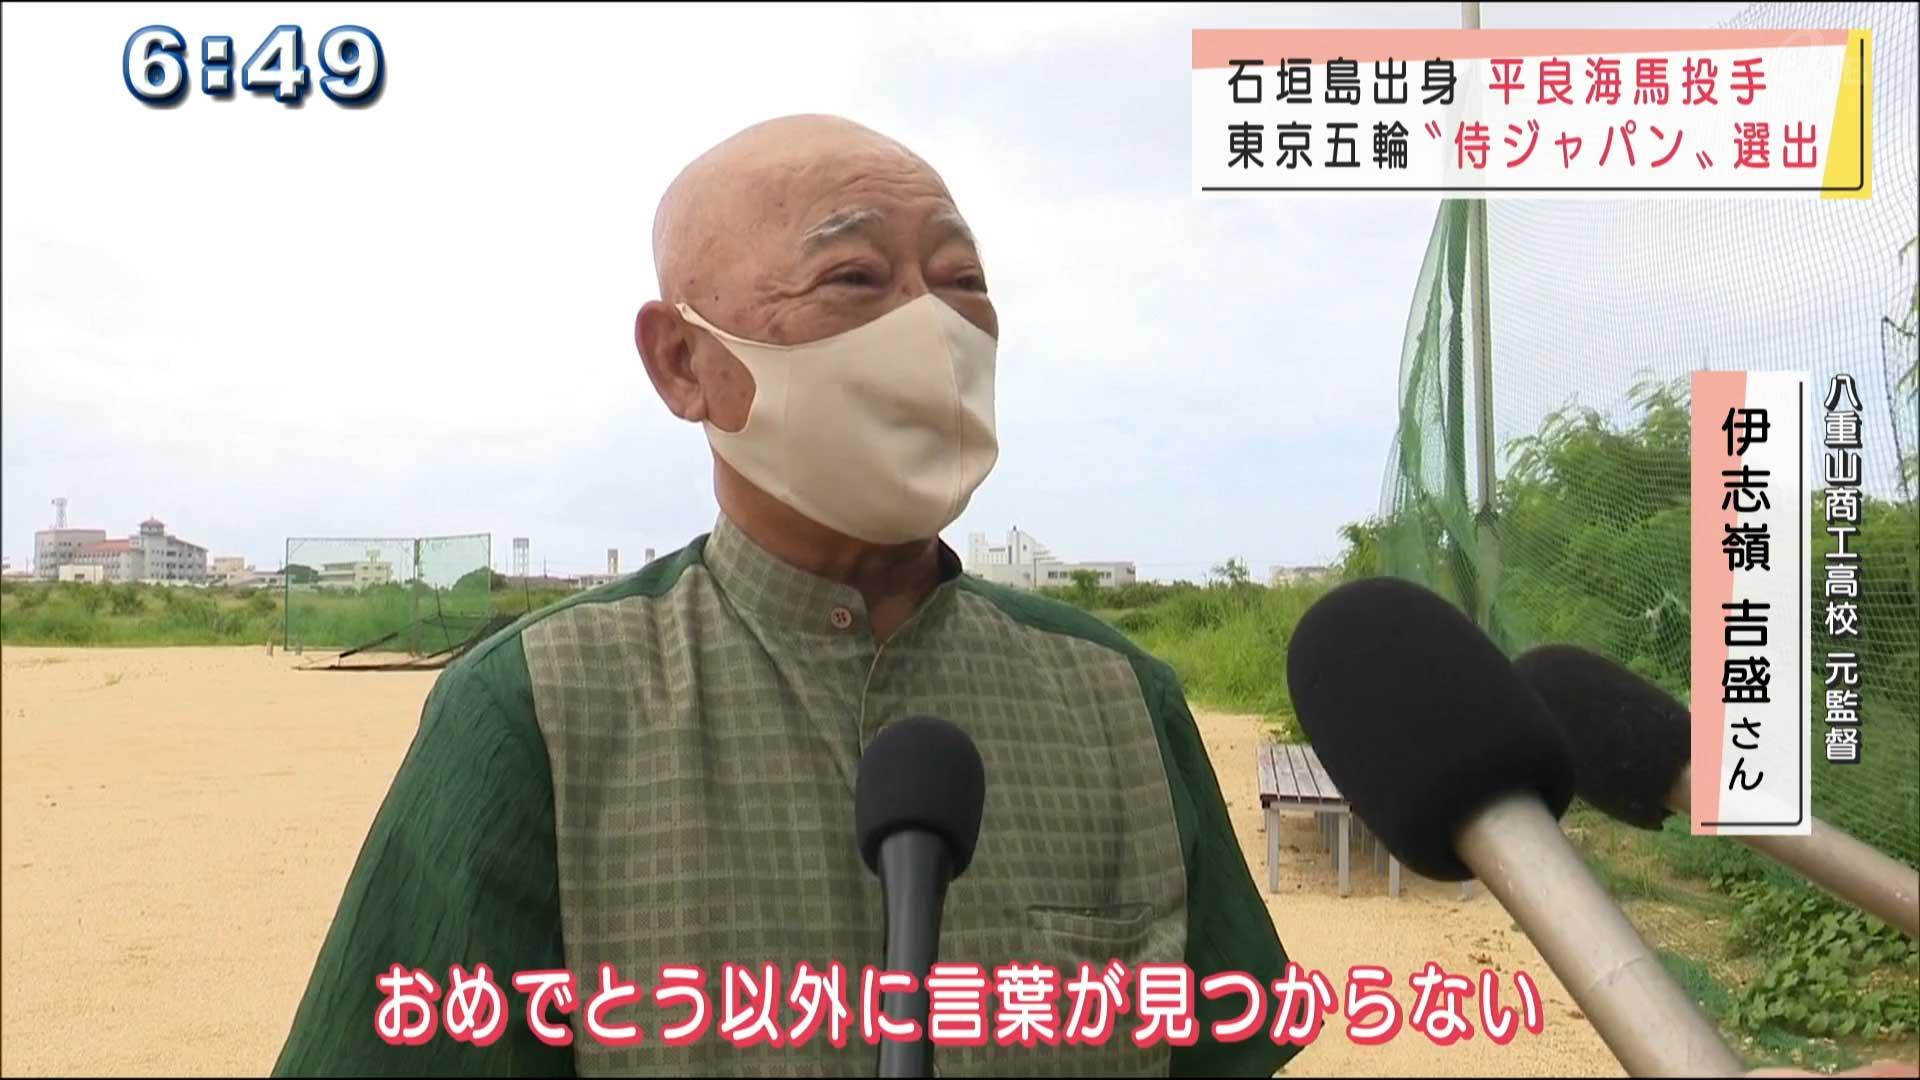 東京五輪野球代表に平良海馬選出 恩師も祝福